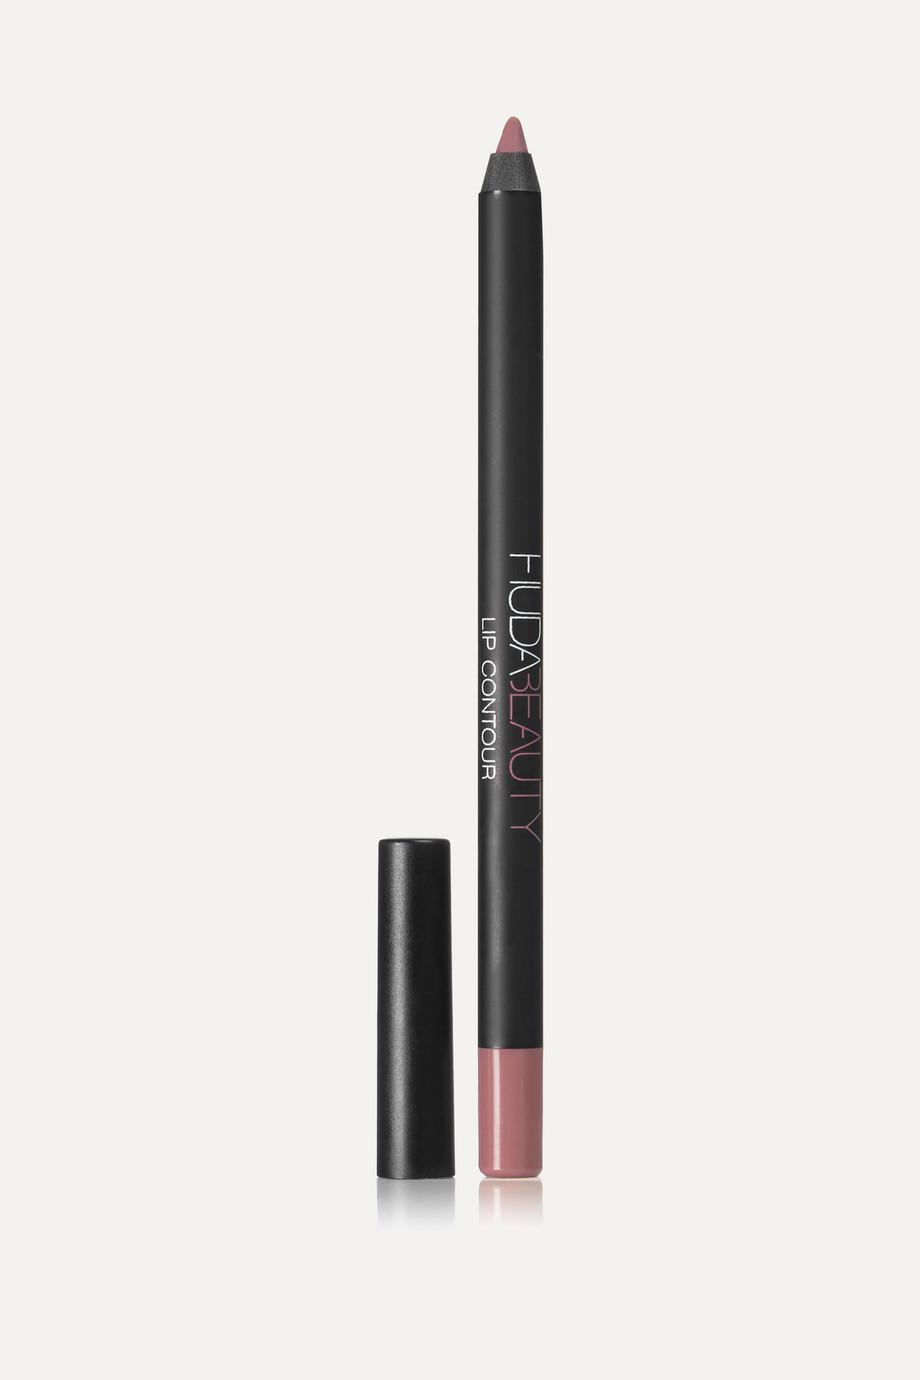 Huda Beauty Lip Contour - Wifey